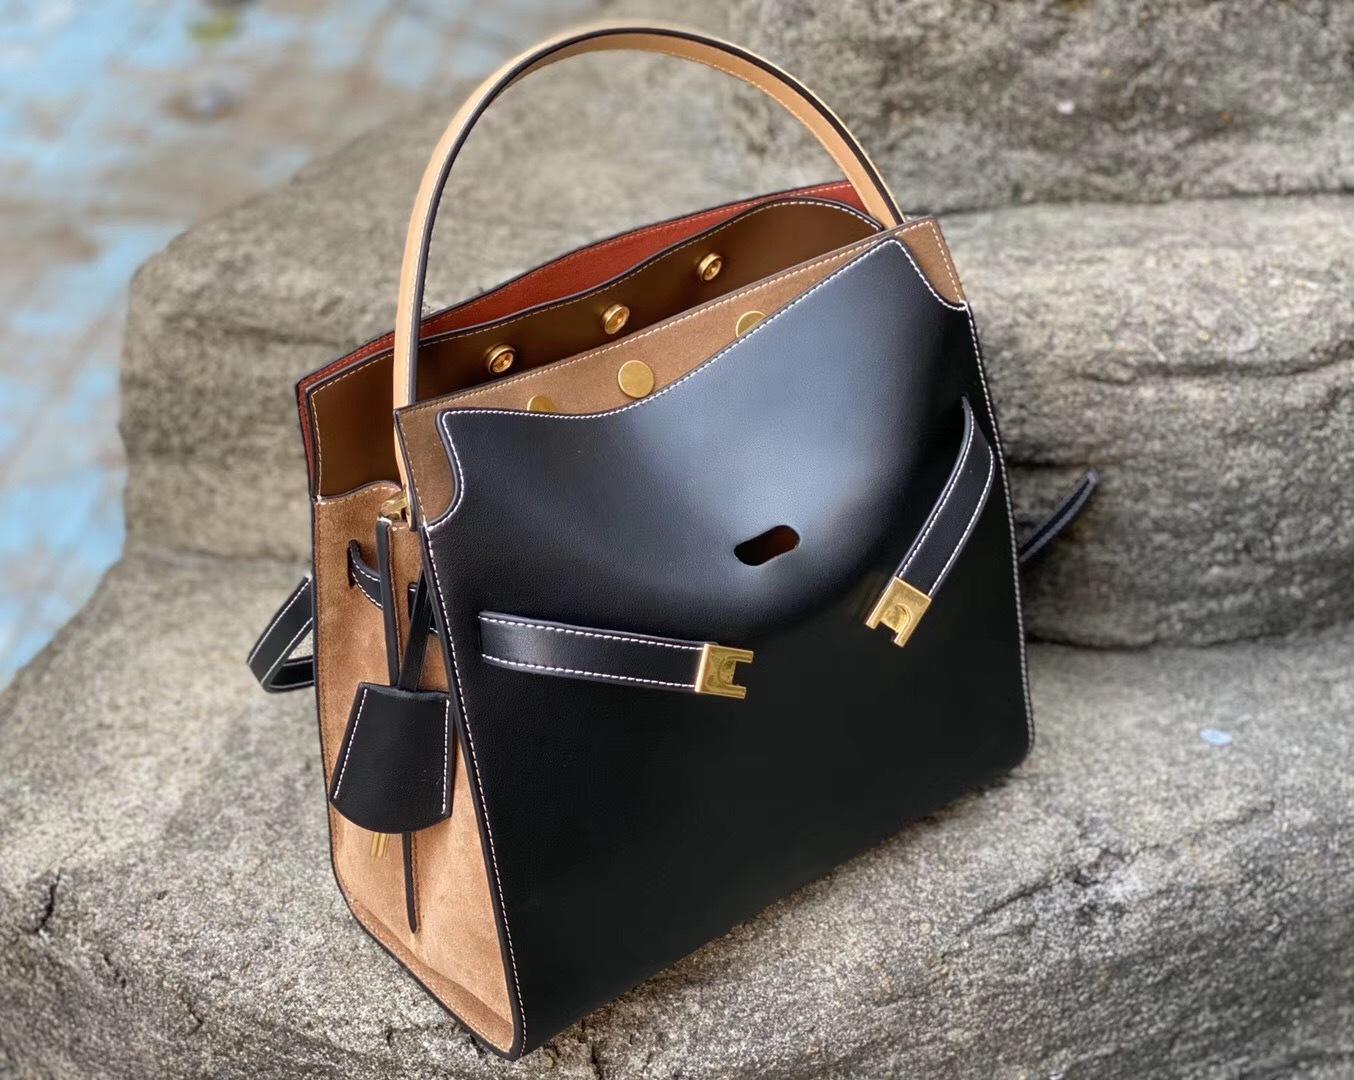 Tory Burch Lee Radziwill Double Bag image 2